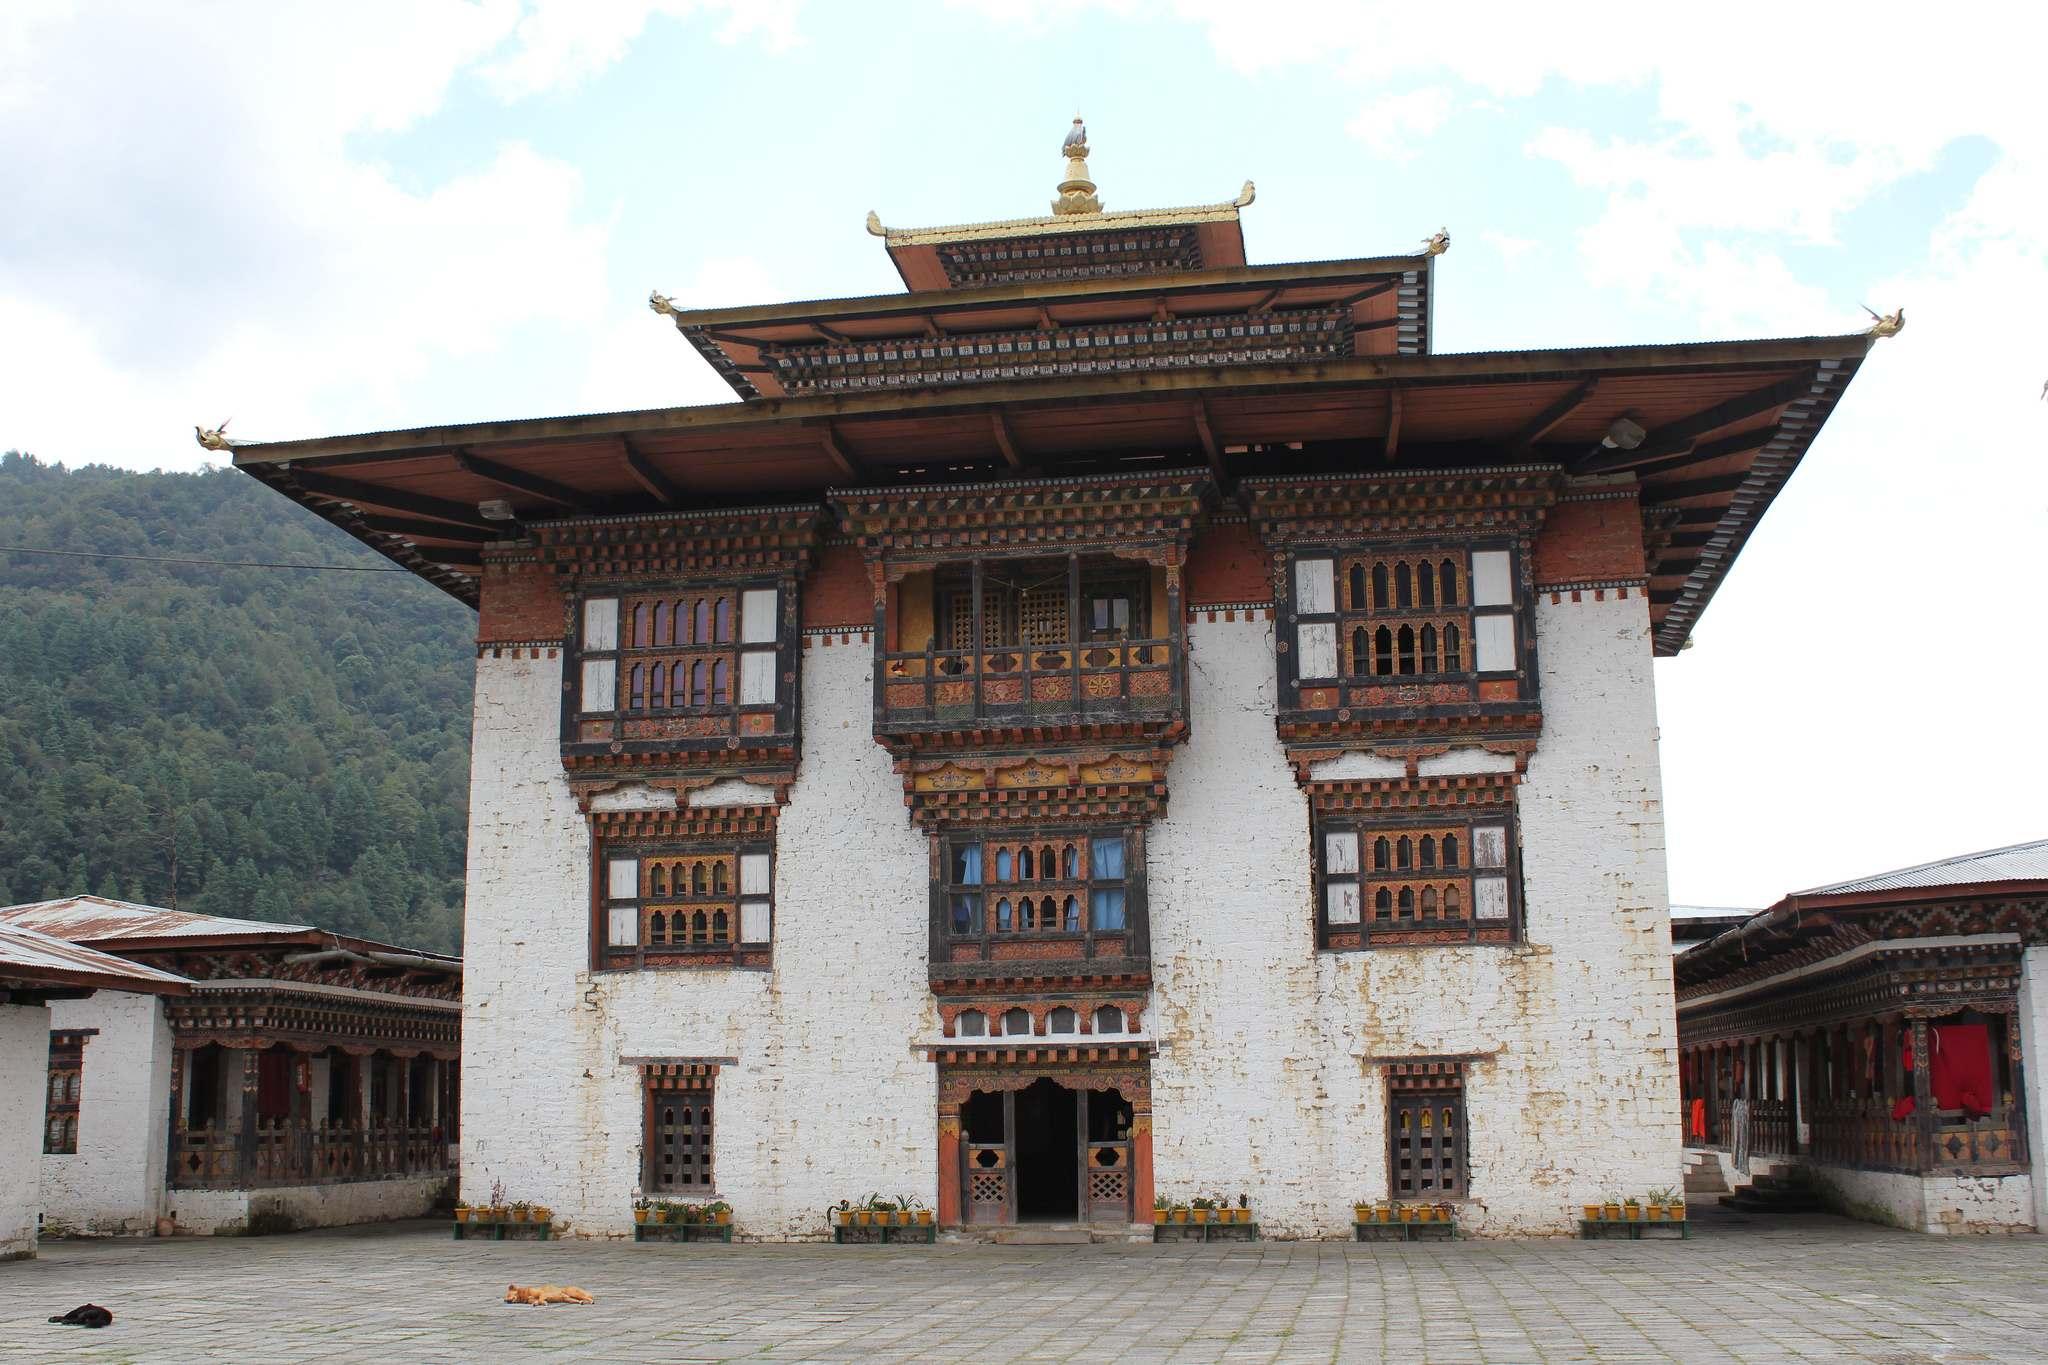 bhutan13 Bhutan   The Land of the Thunder Dragon